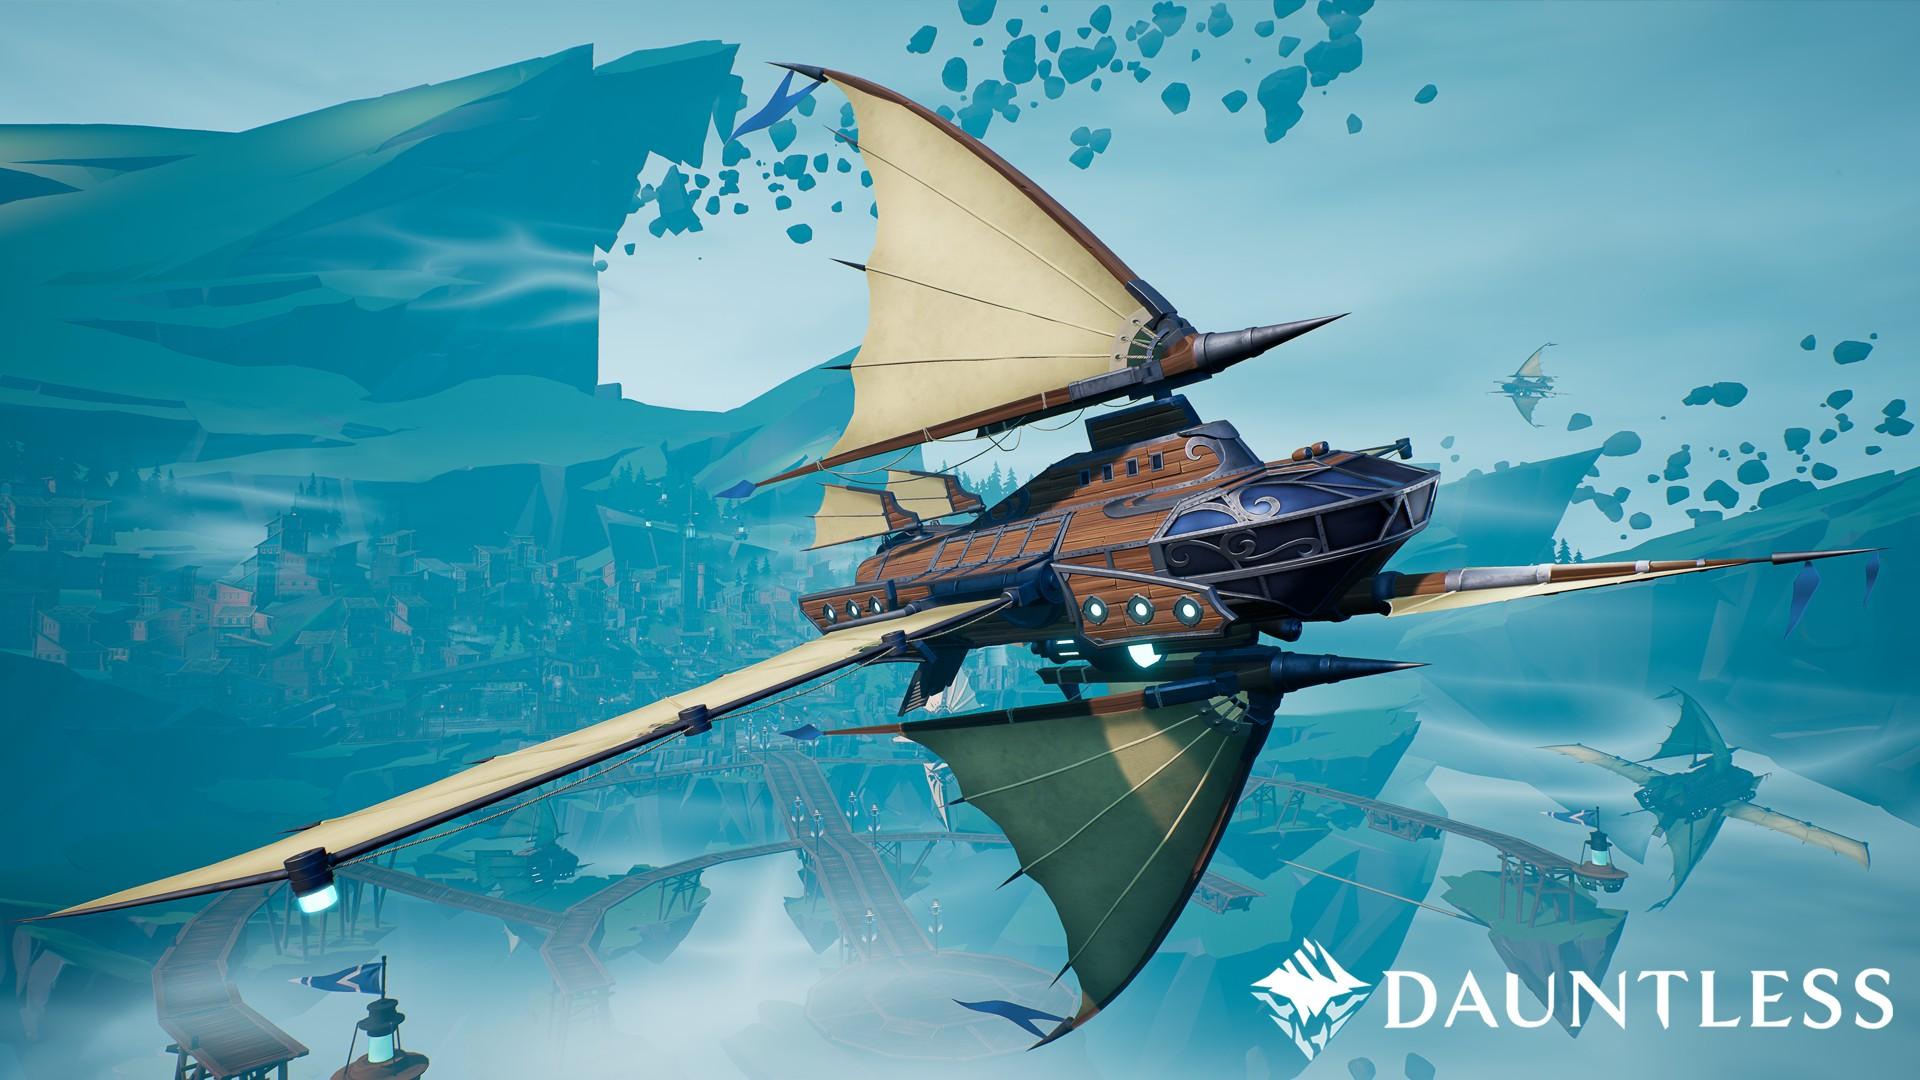 Co-Optimus - Video - Dauntless Enters Closed Beta Today